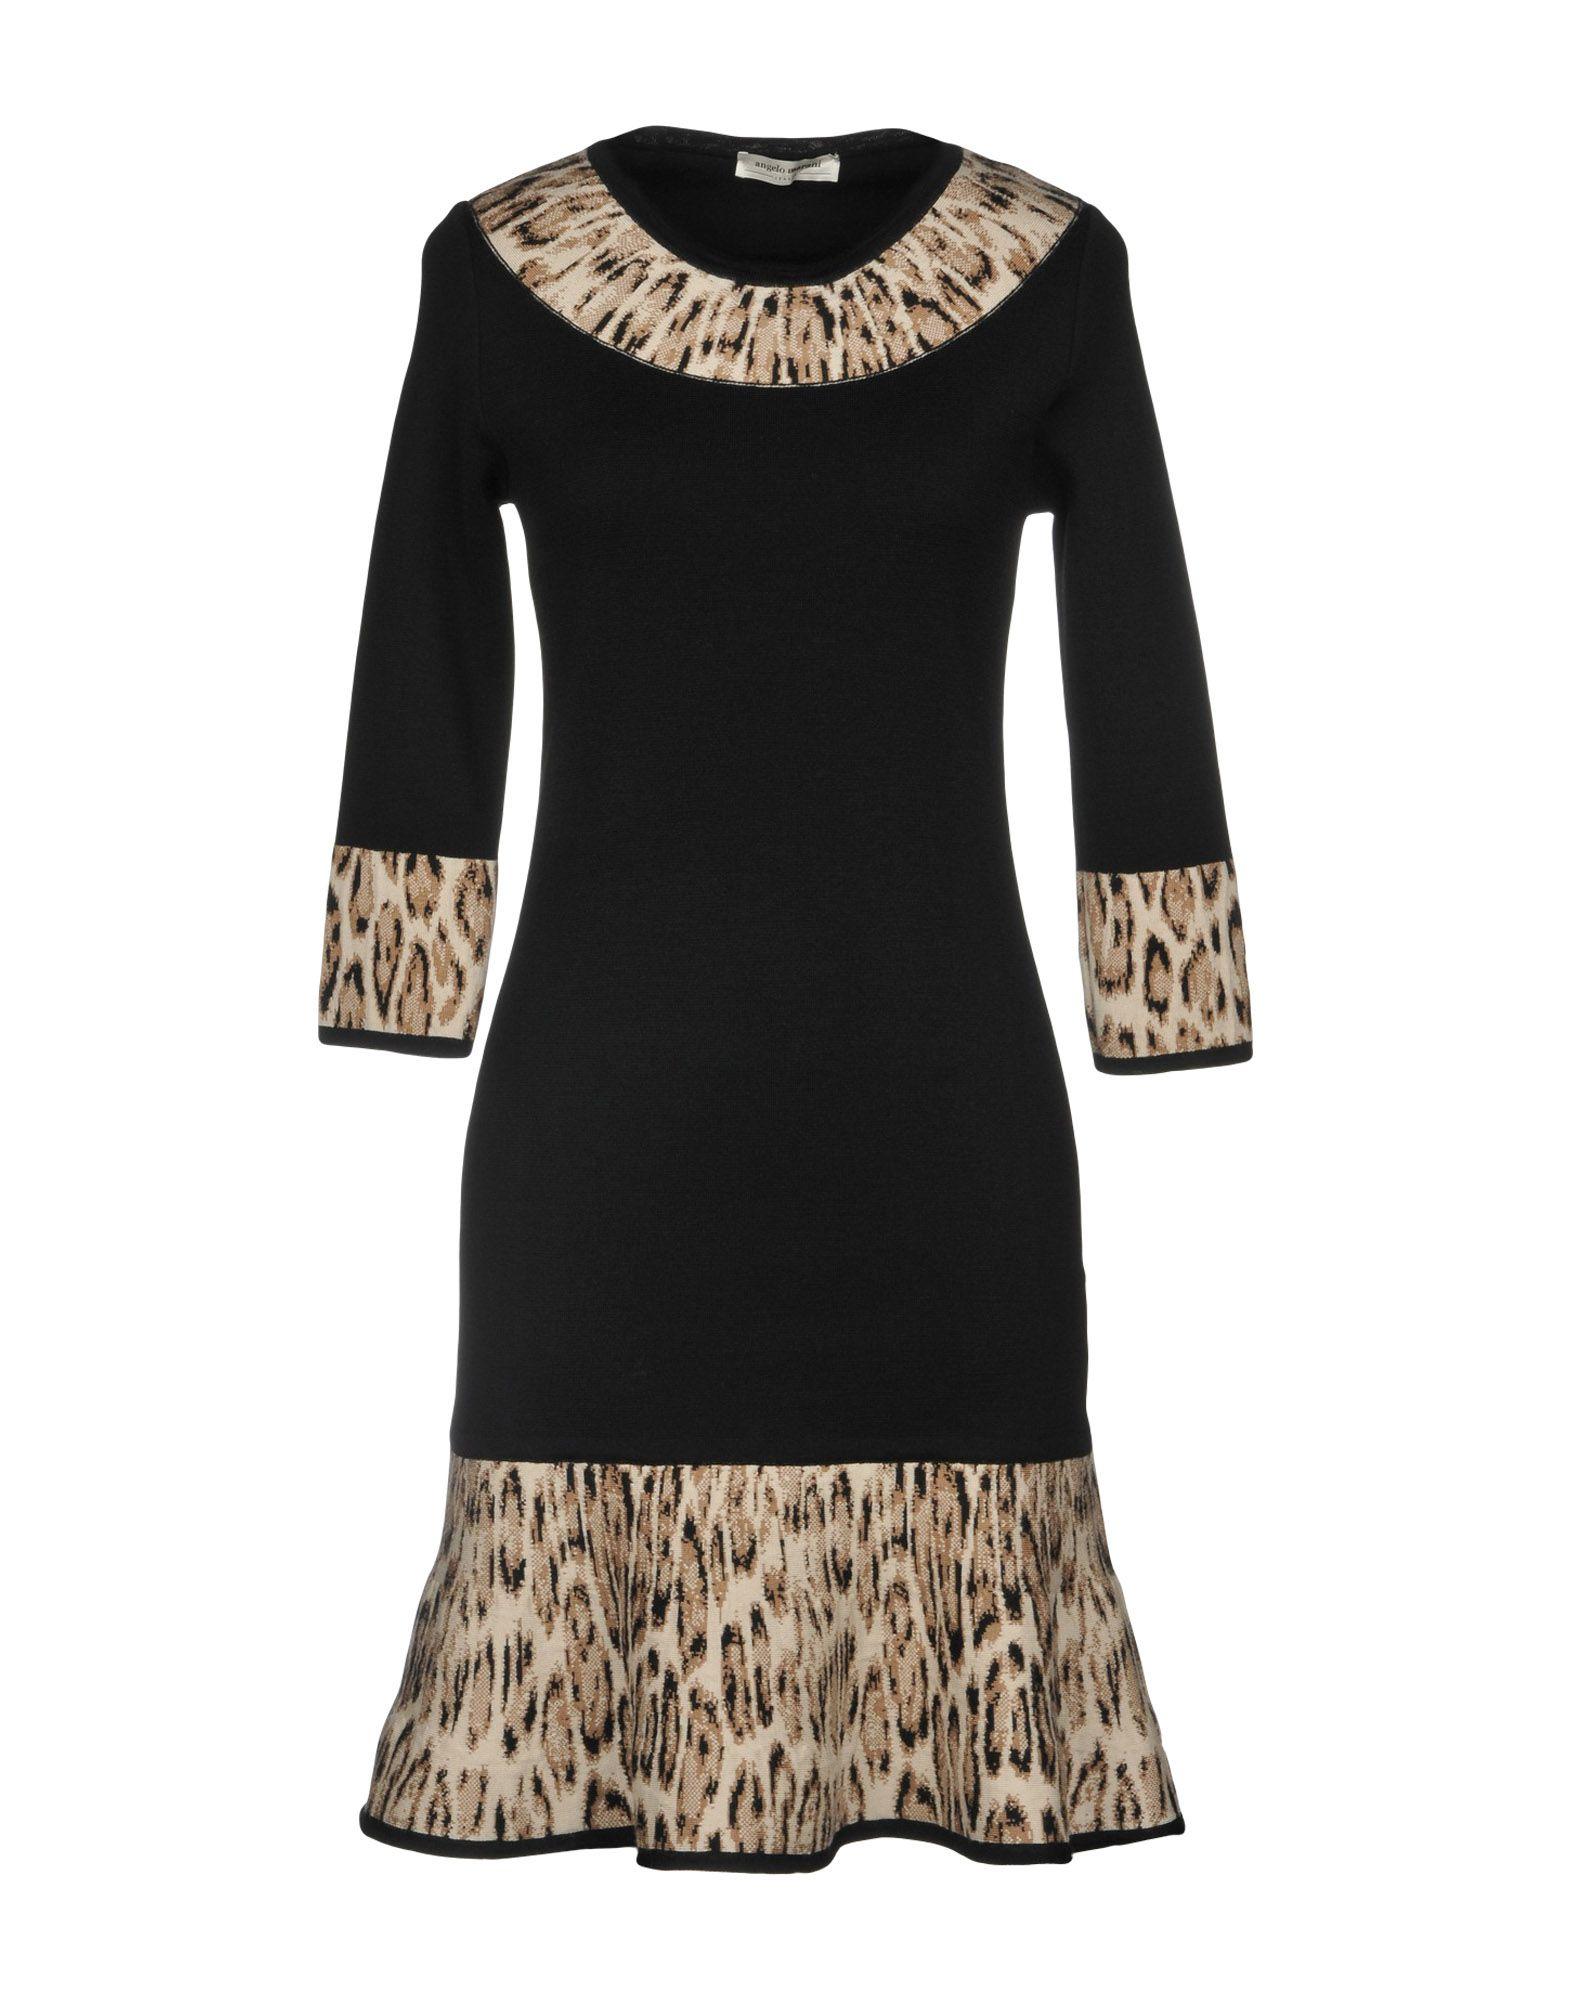 120d19e825b Angelo Marani Knit Dress - Women Angelo Marani Knit Dresses online ...